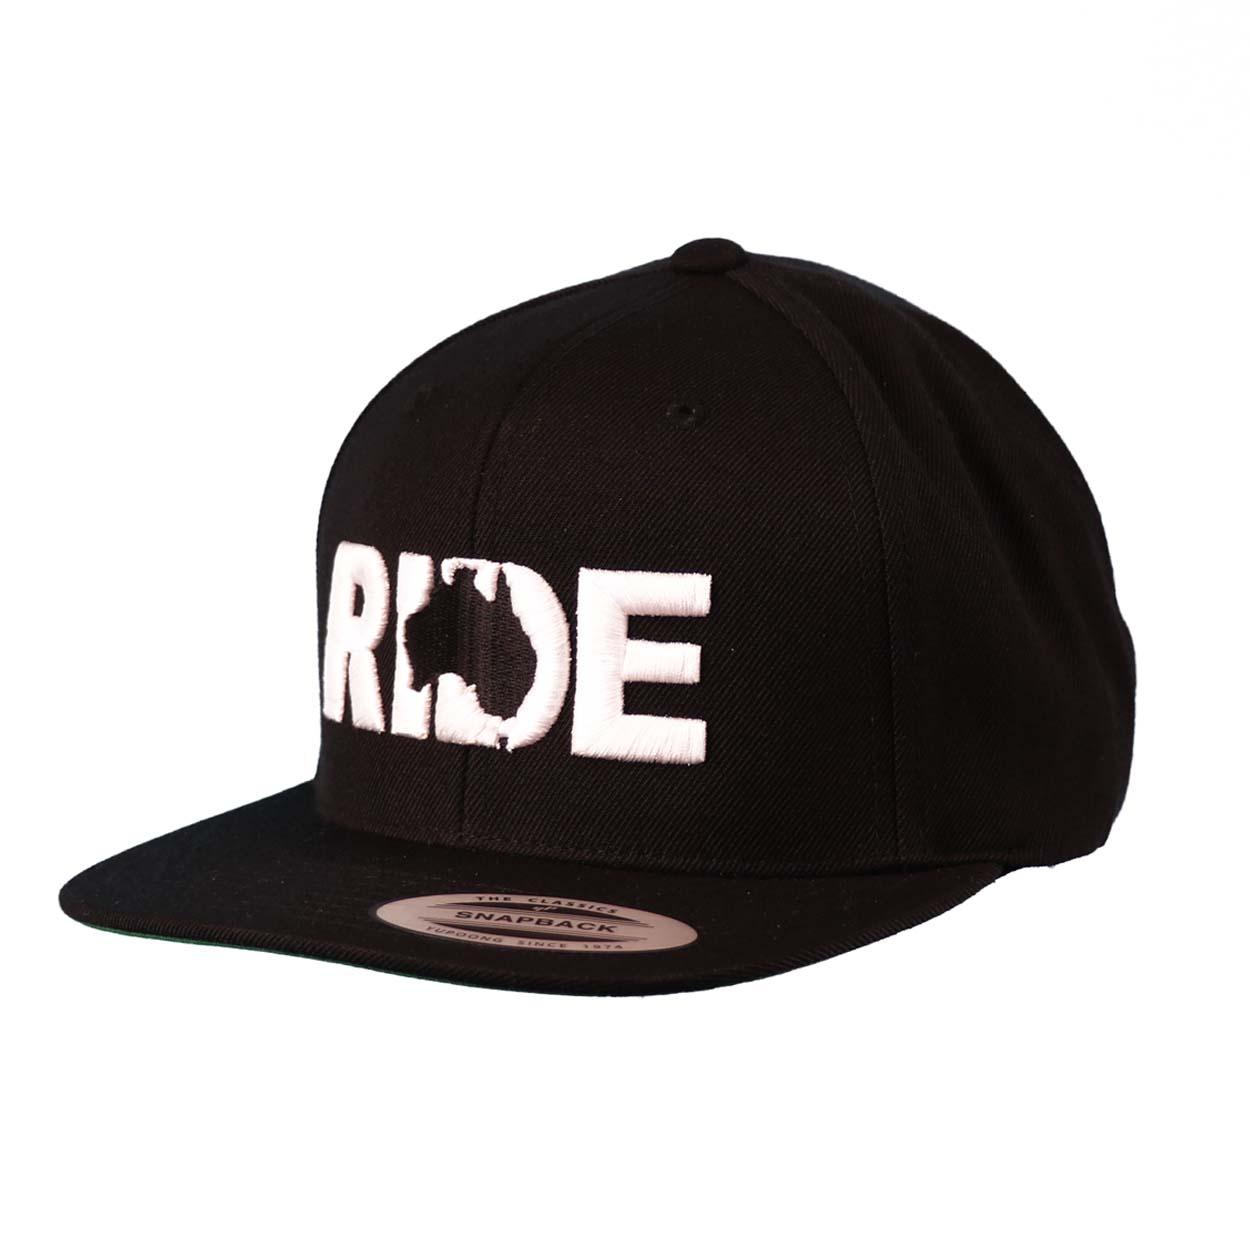 Ride Australia Classic Embroidered  Snapback Flat Brim Hat Black/White